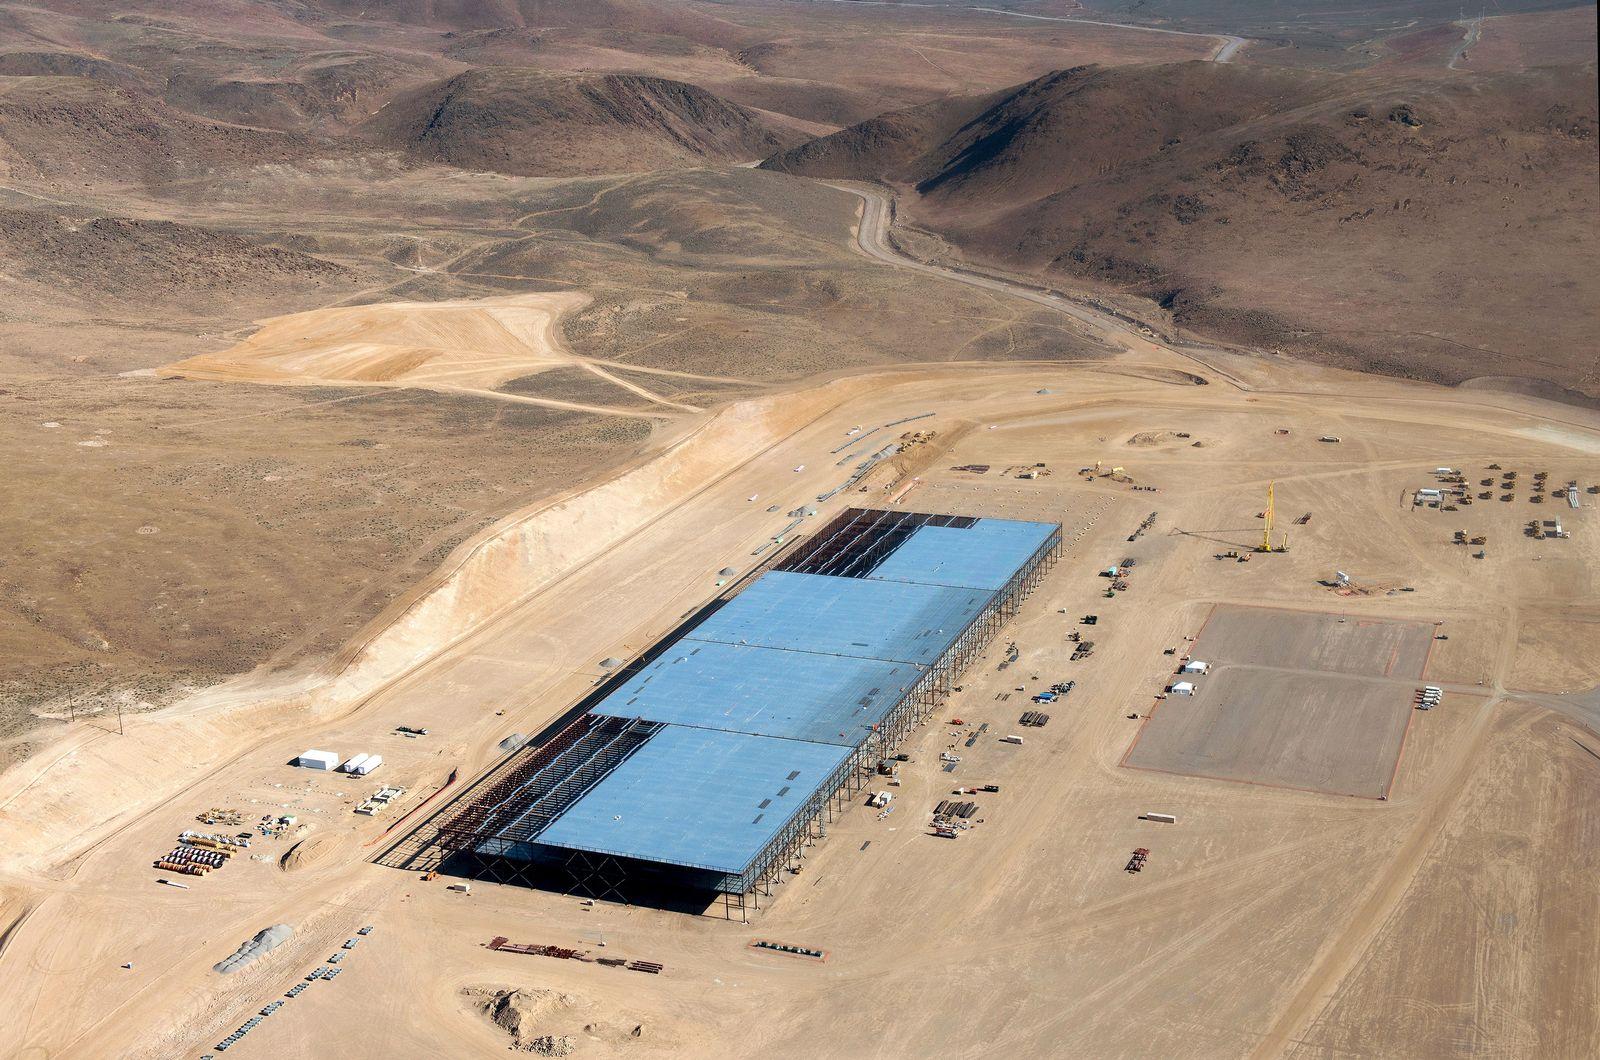 Tesla Gigafactory Baustelle